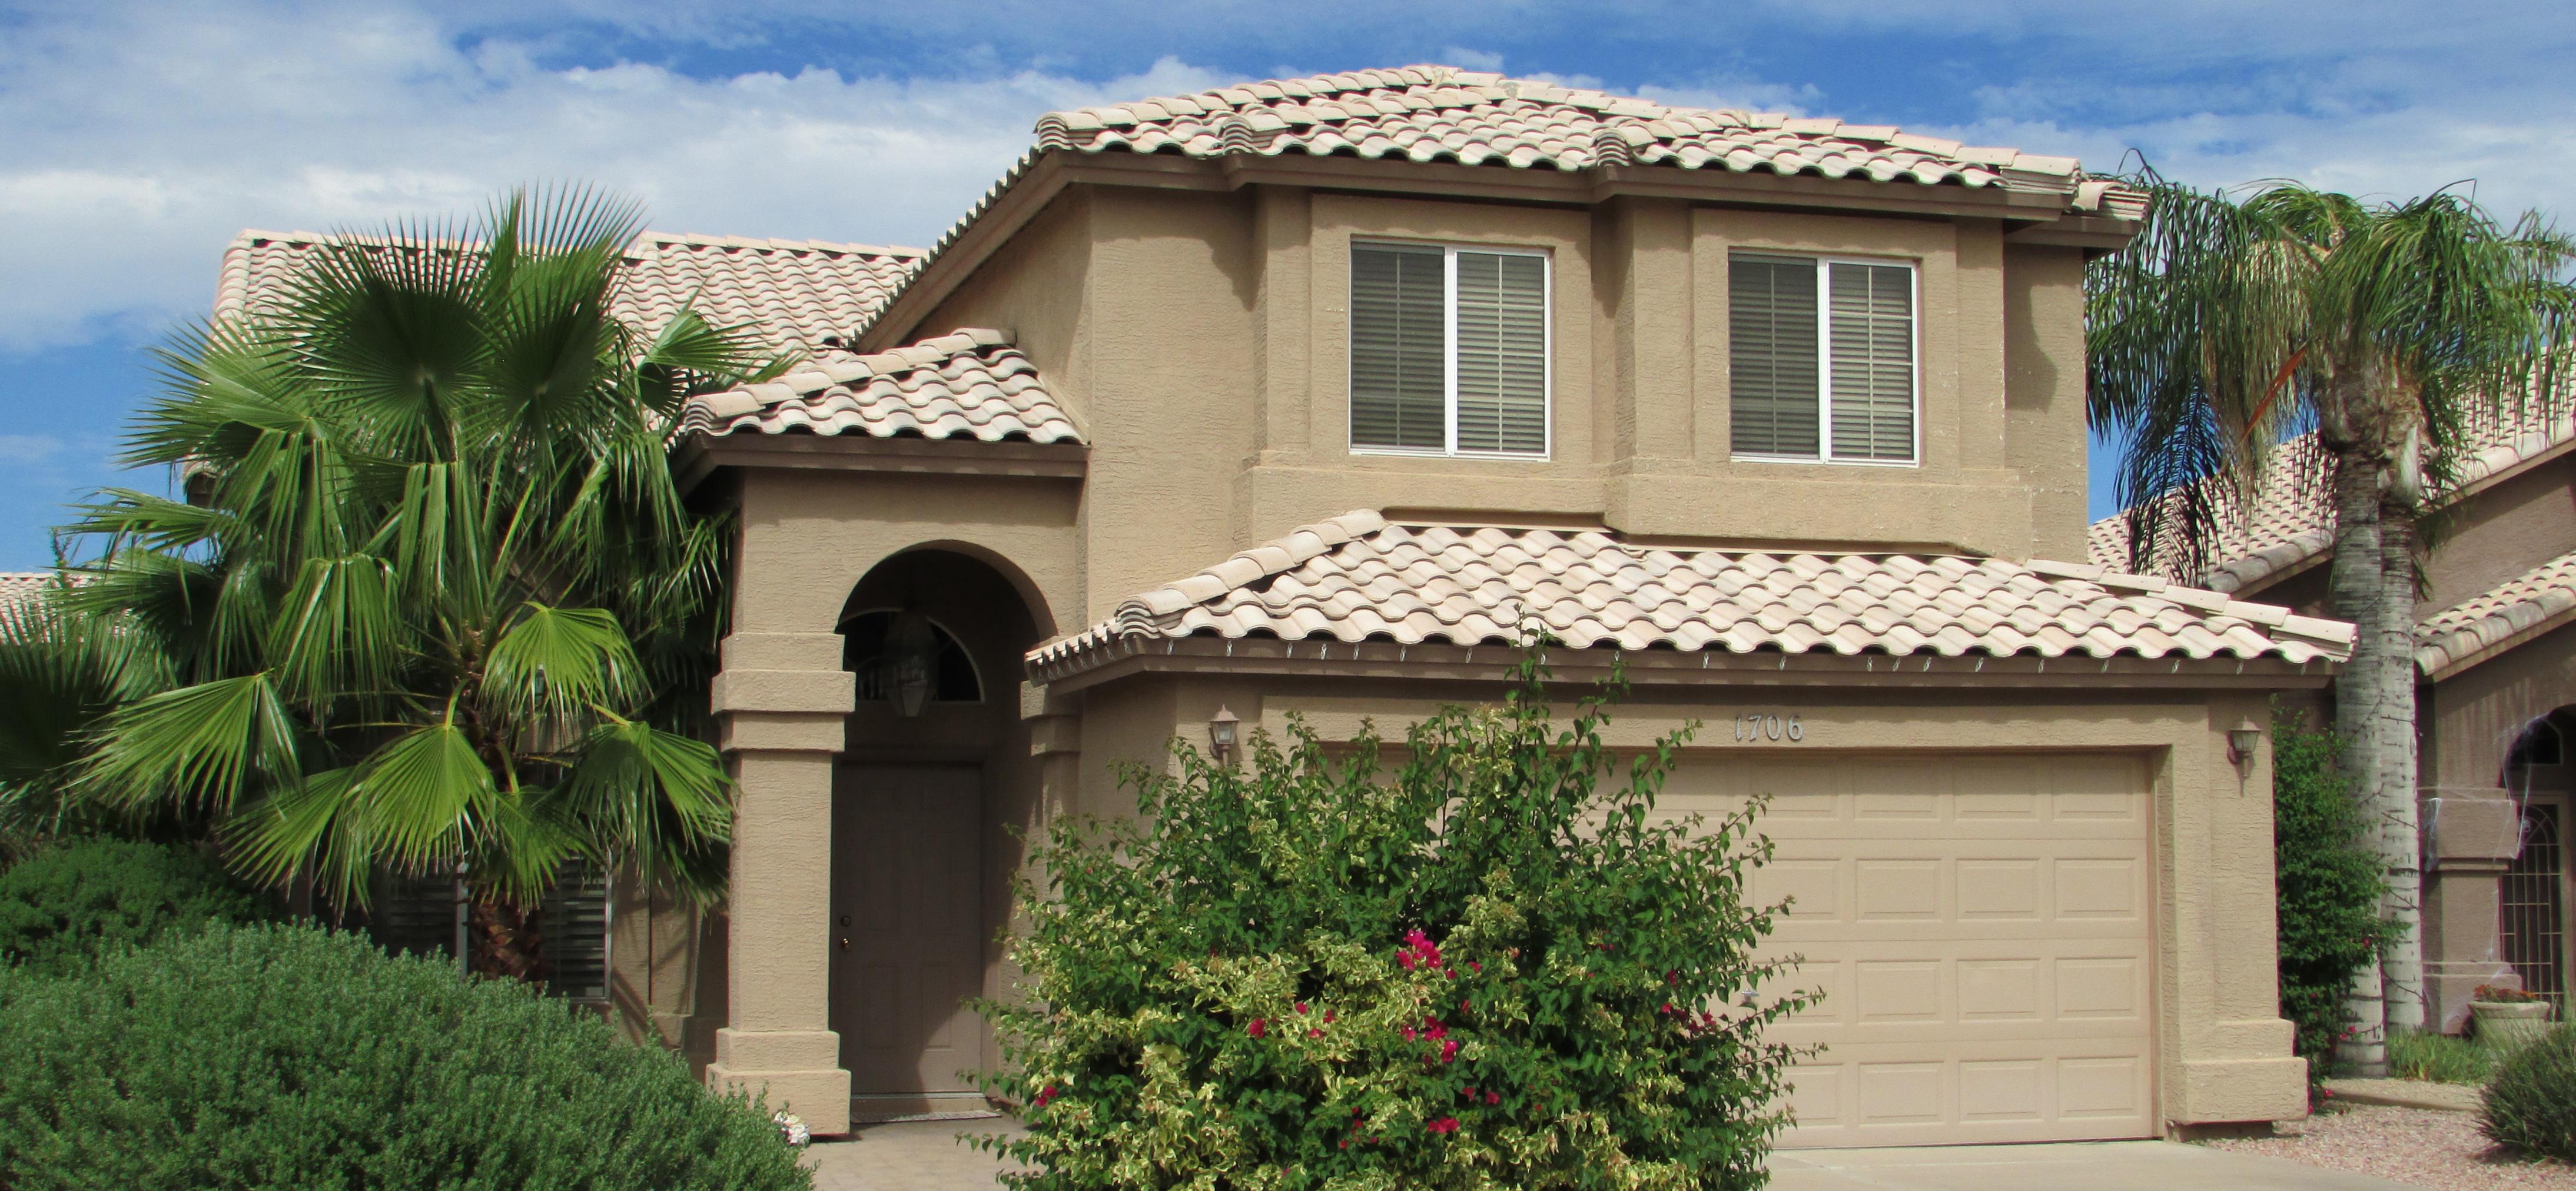 1706 W San Remo St, Gilbert Arizona 85233 - Golf Community, 3 bedroom home- Bill Salvatore, Realty Excellence East Valley, Arizona Elite Properties - 602-999-0952